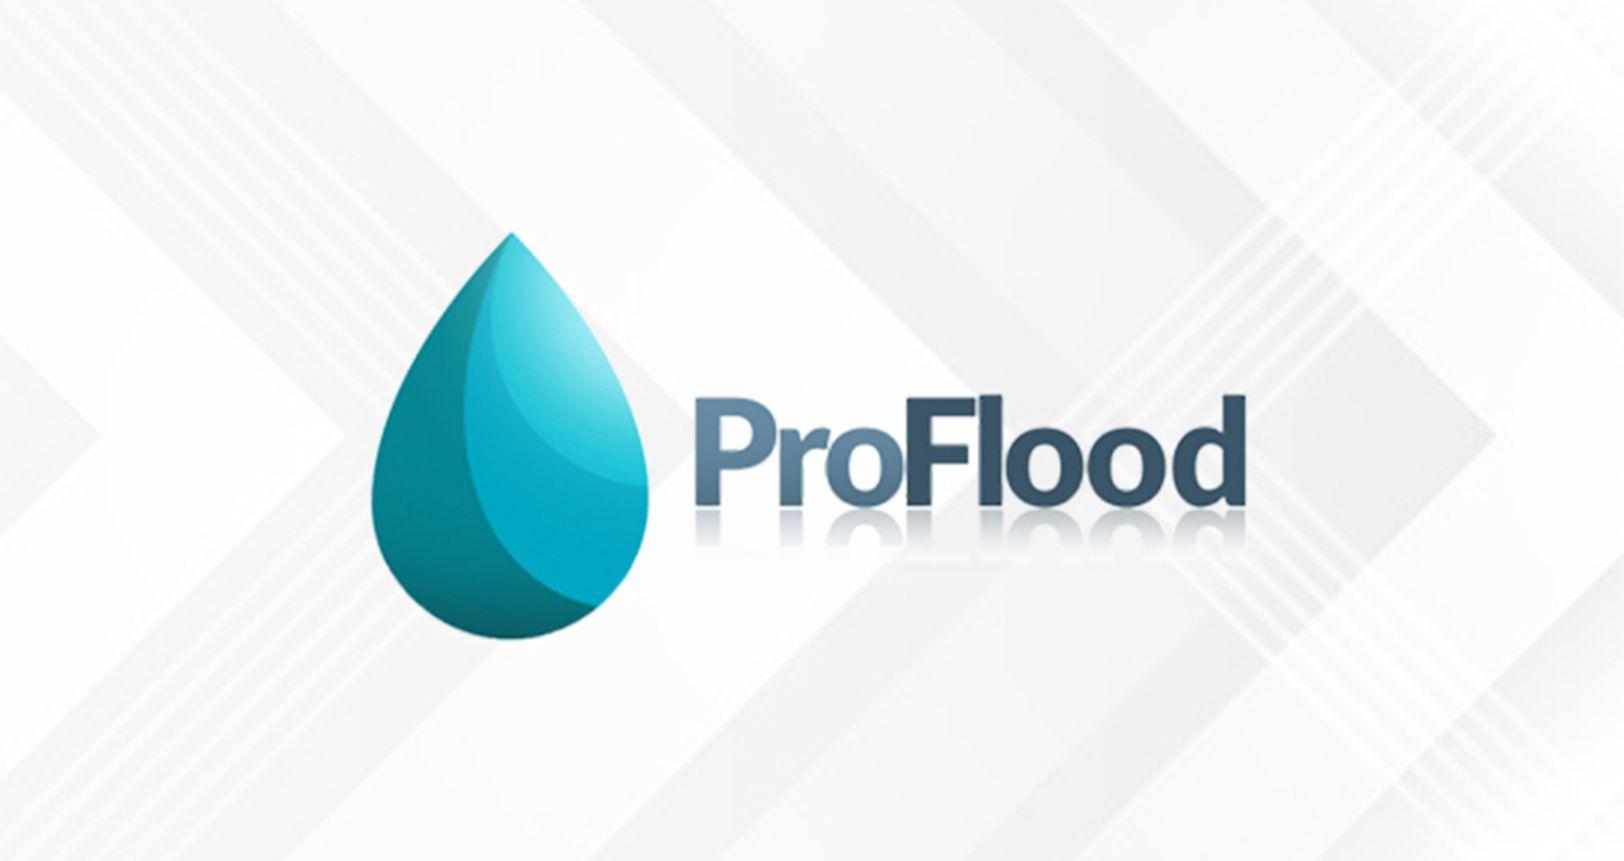 proflood-1-1